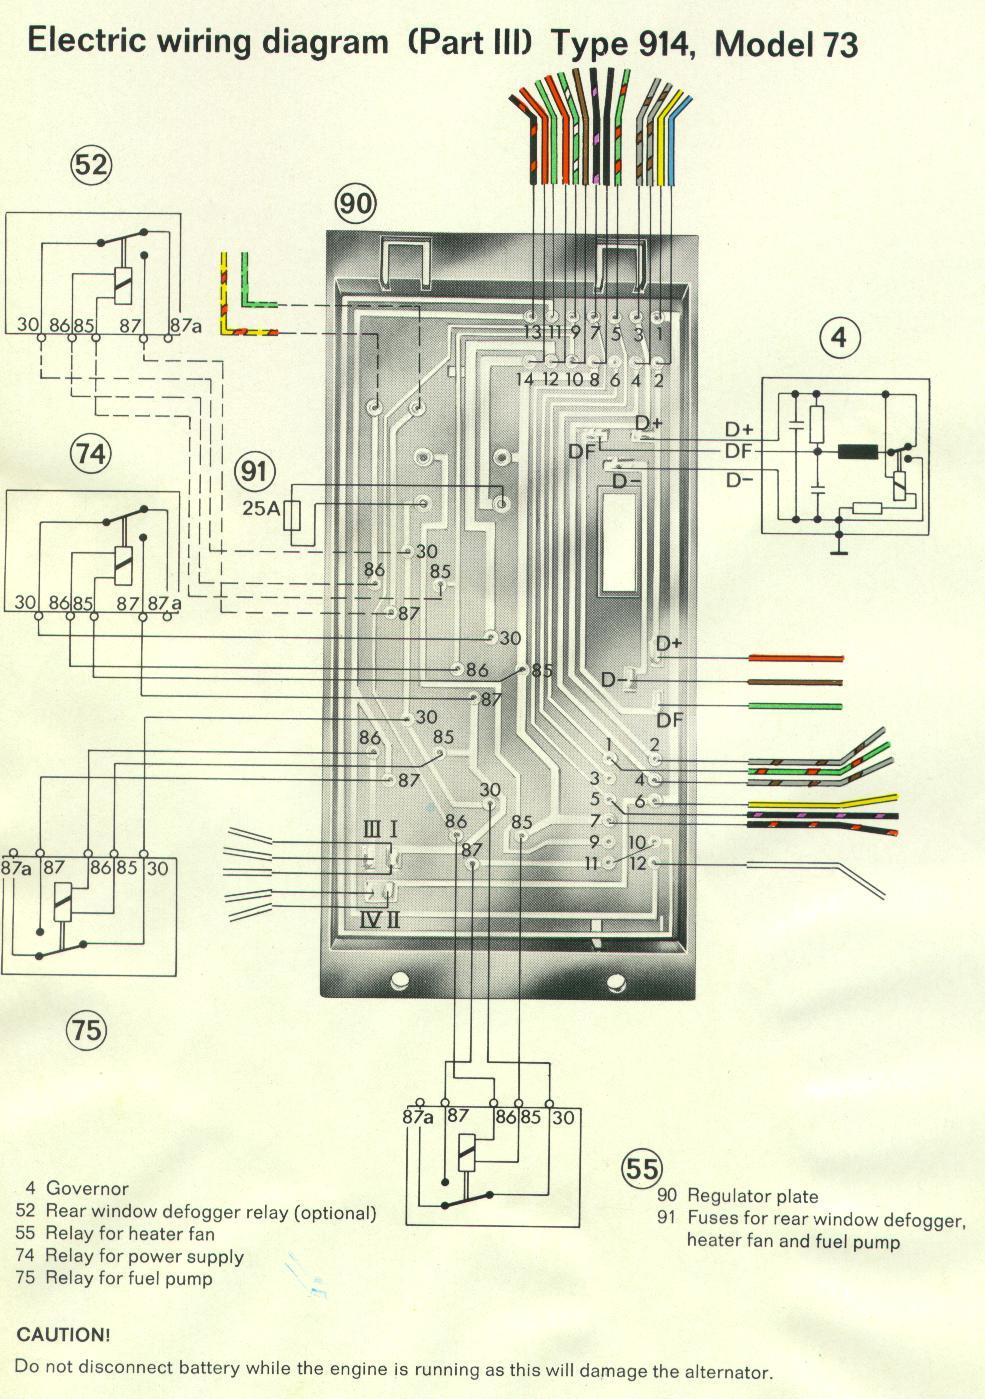 914world > Fuel Pump Wire Number. Corvette. 1982 Corvette Rear Window Defogger Wiring Diagram At Scoala.co